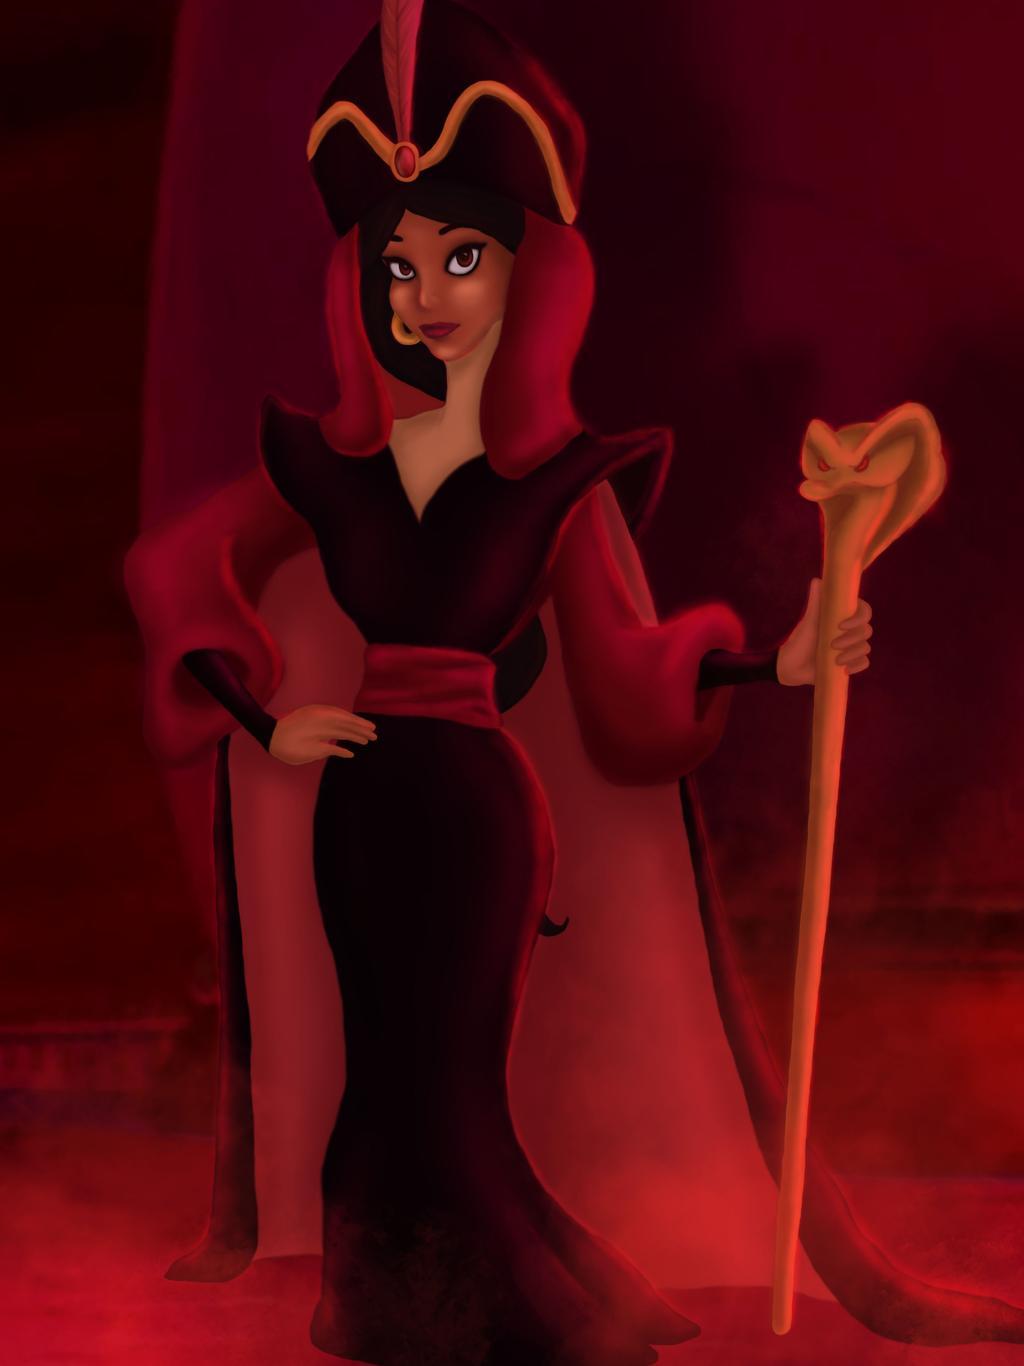 Disney villains reimagined as princesses 13